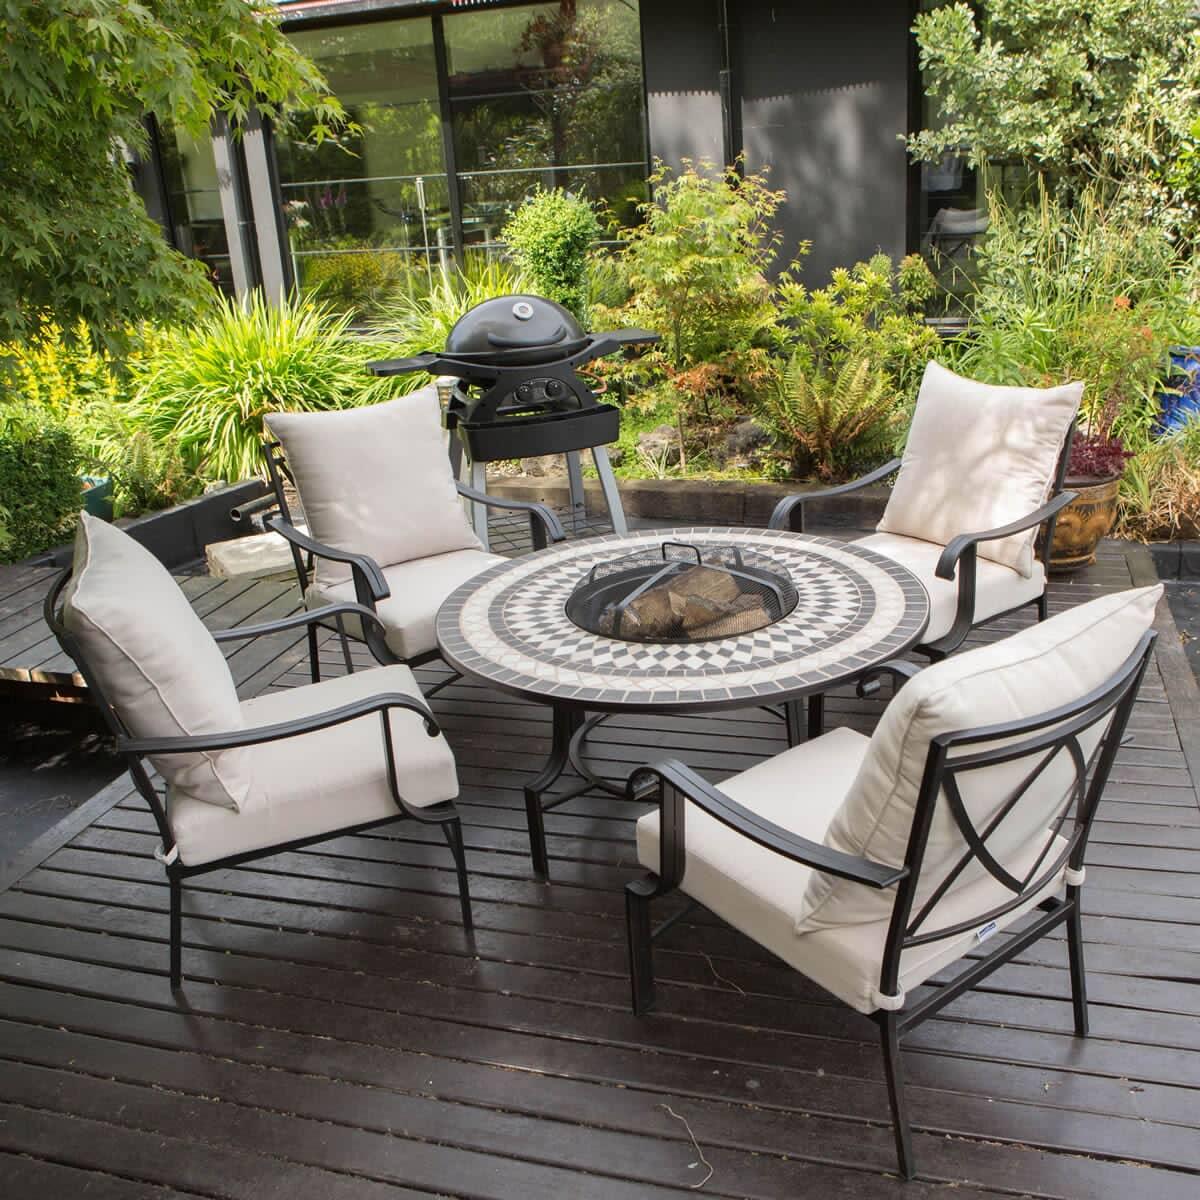 LG Outdoor Casablanca 4 Seat Charcoal Firepit Lounge Set ...